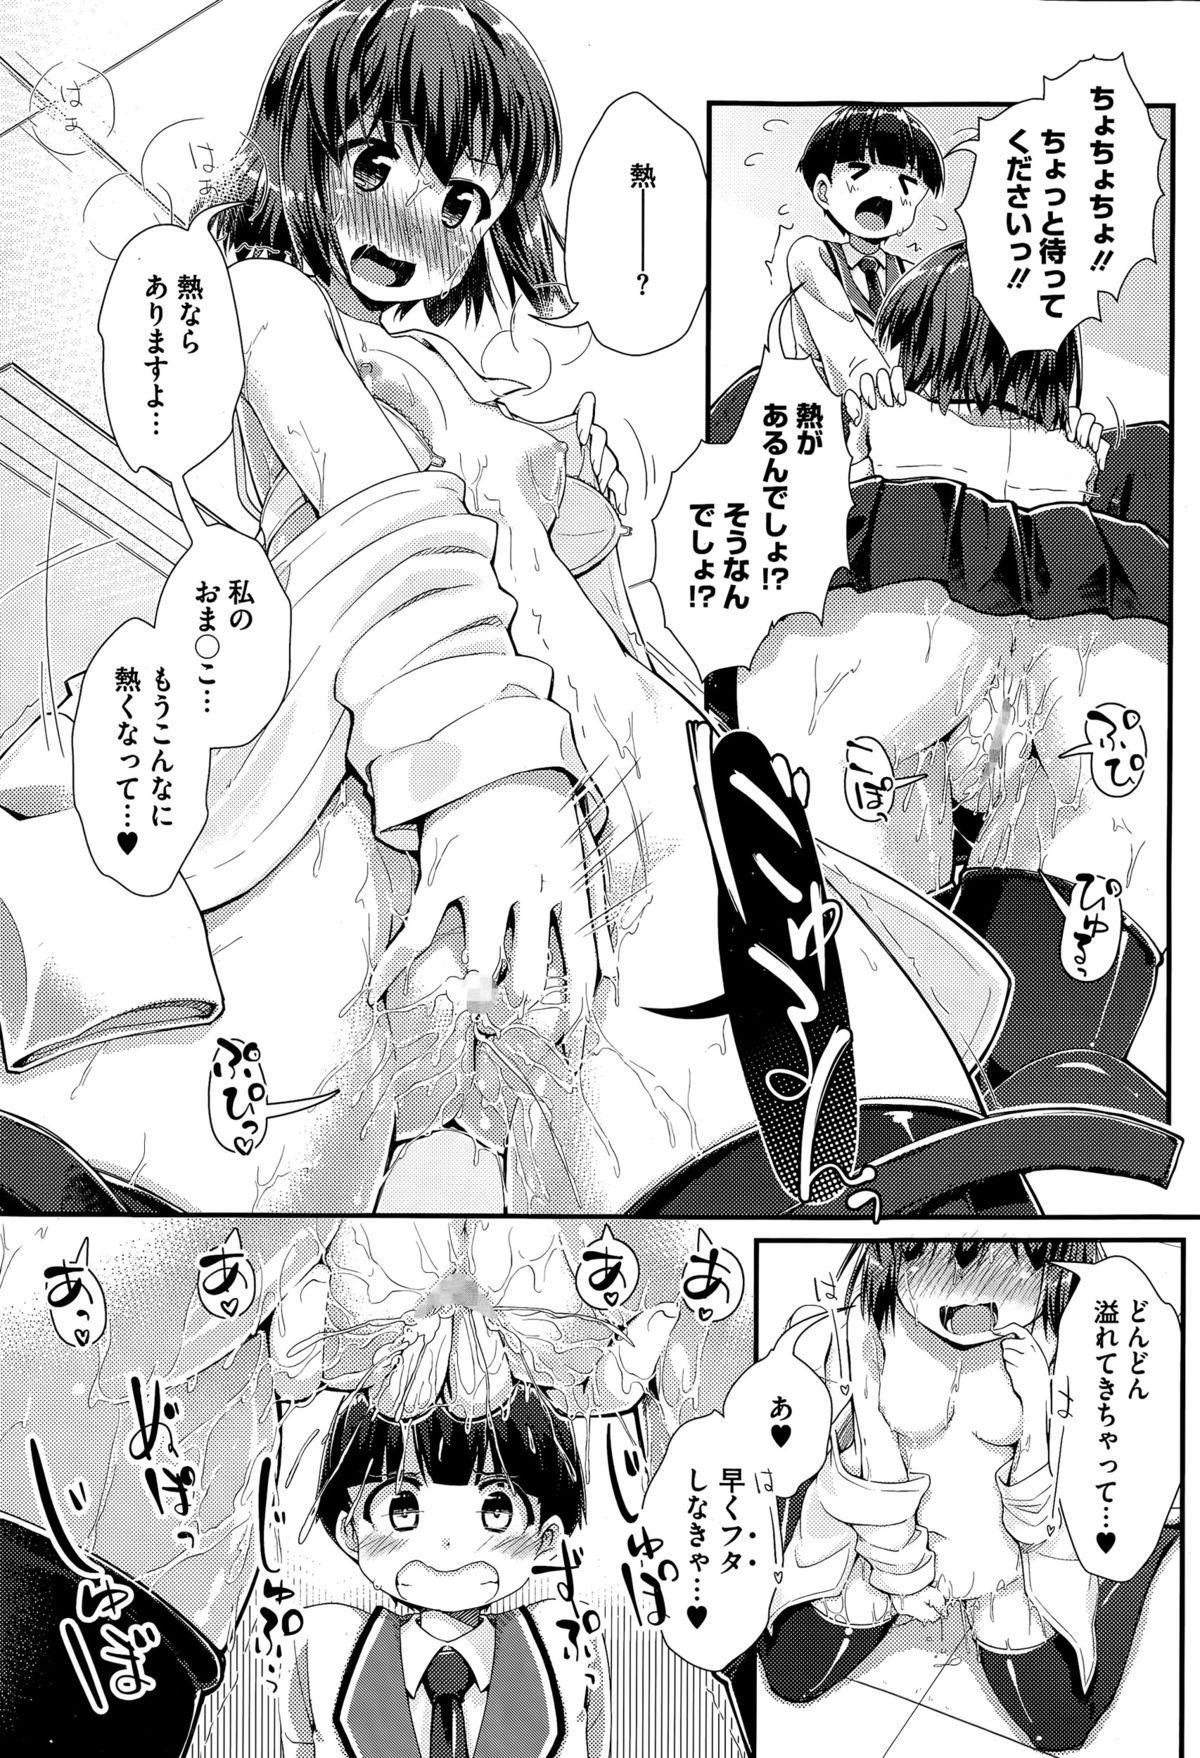 nariyukimakase no obbligato 29